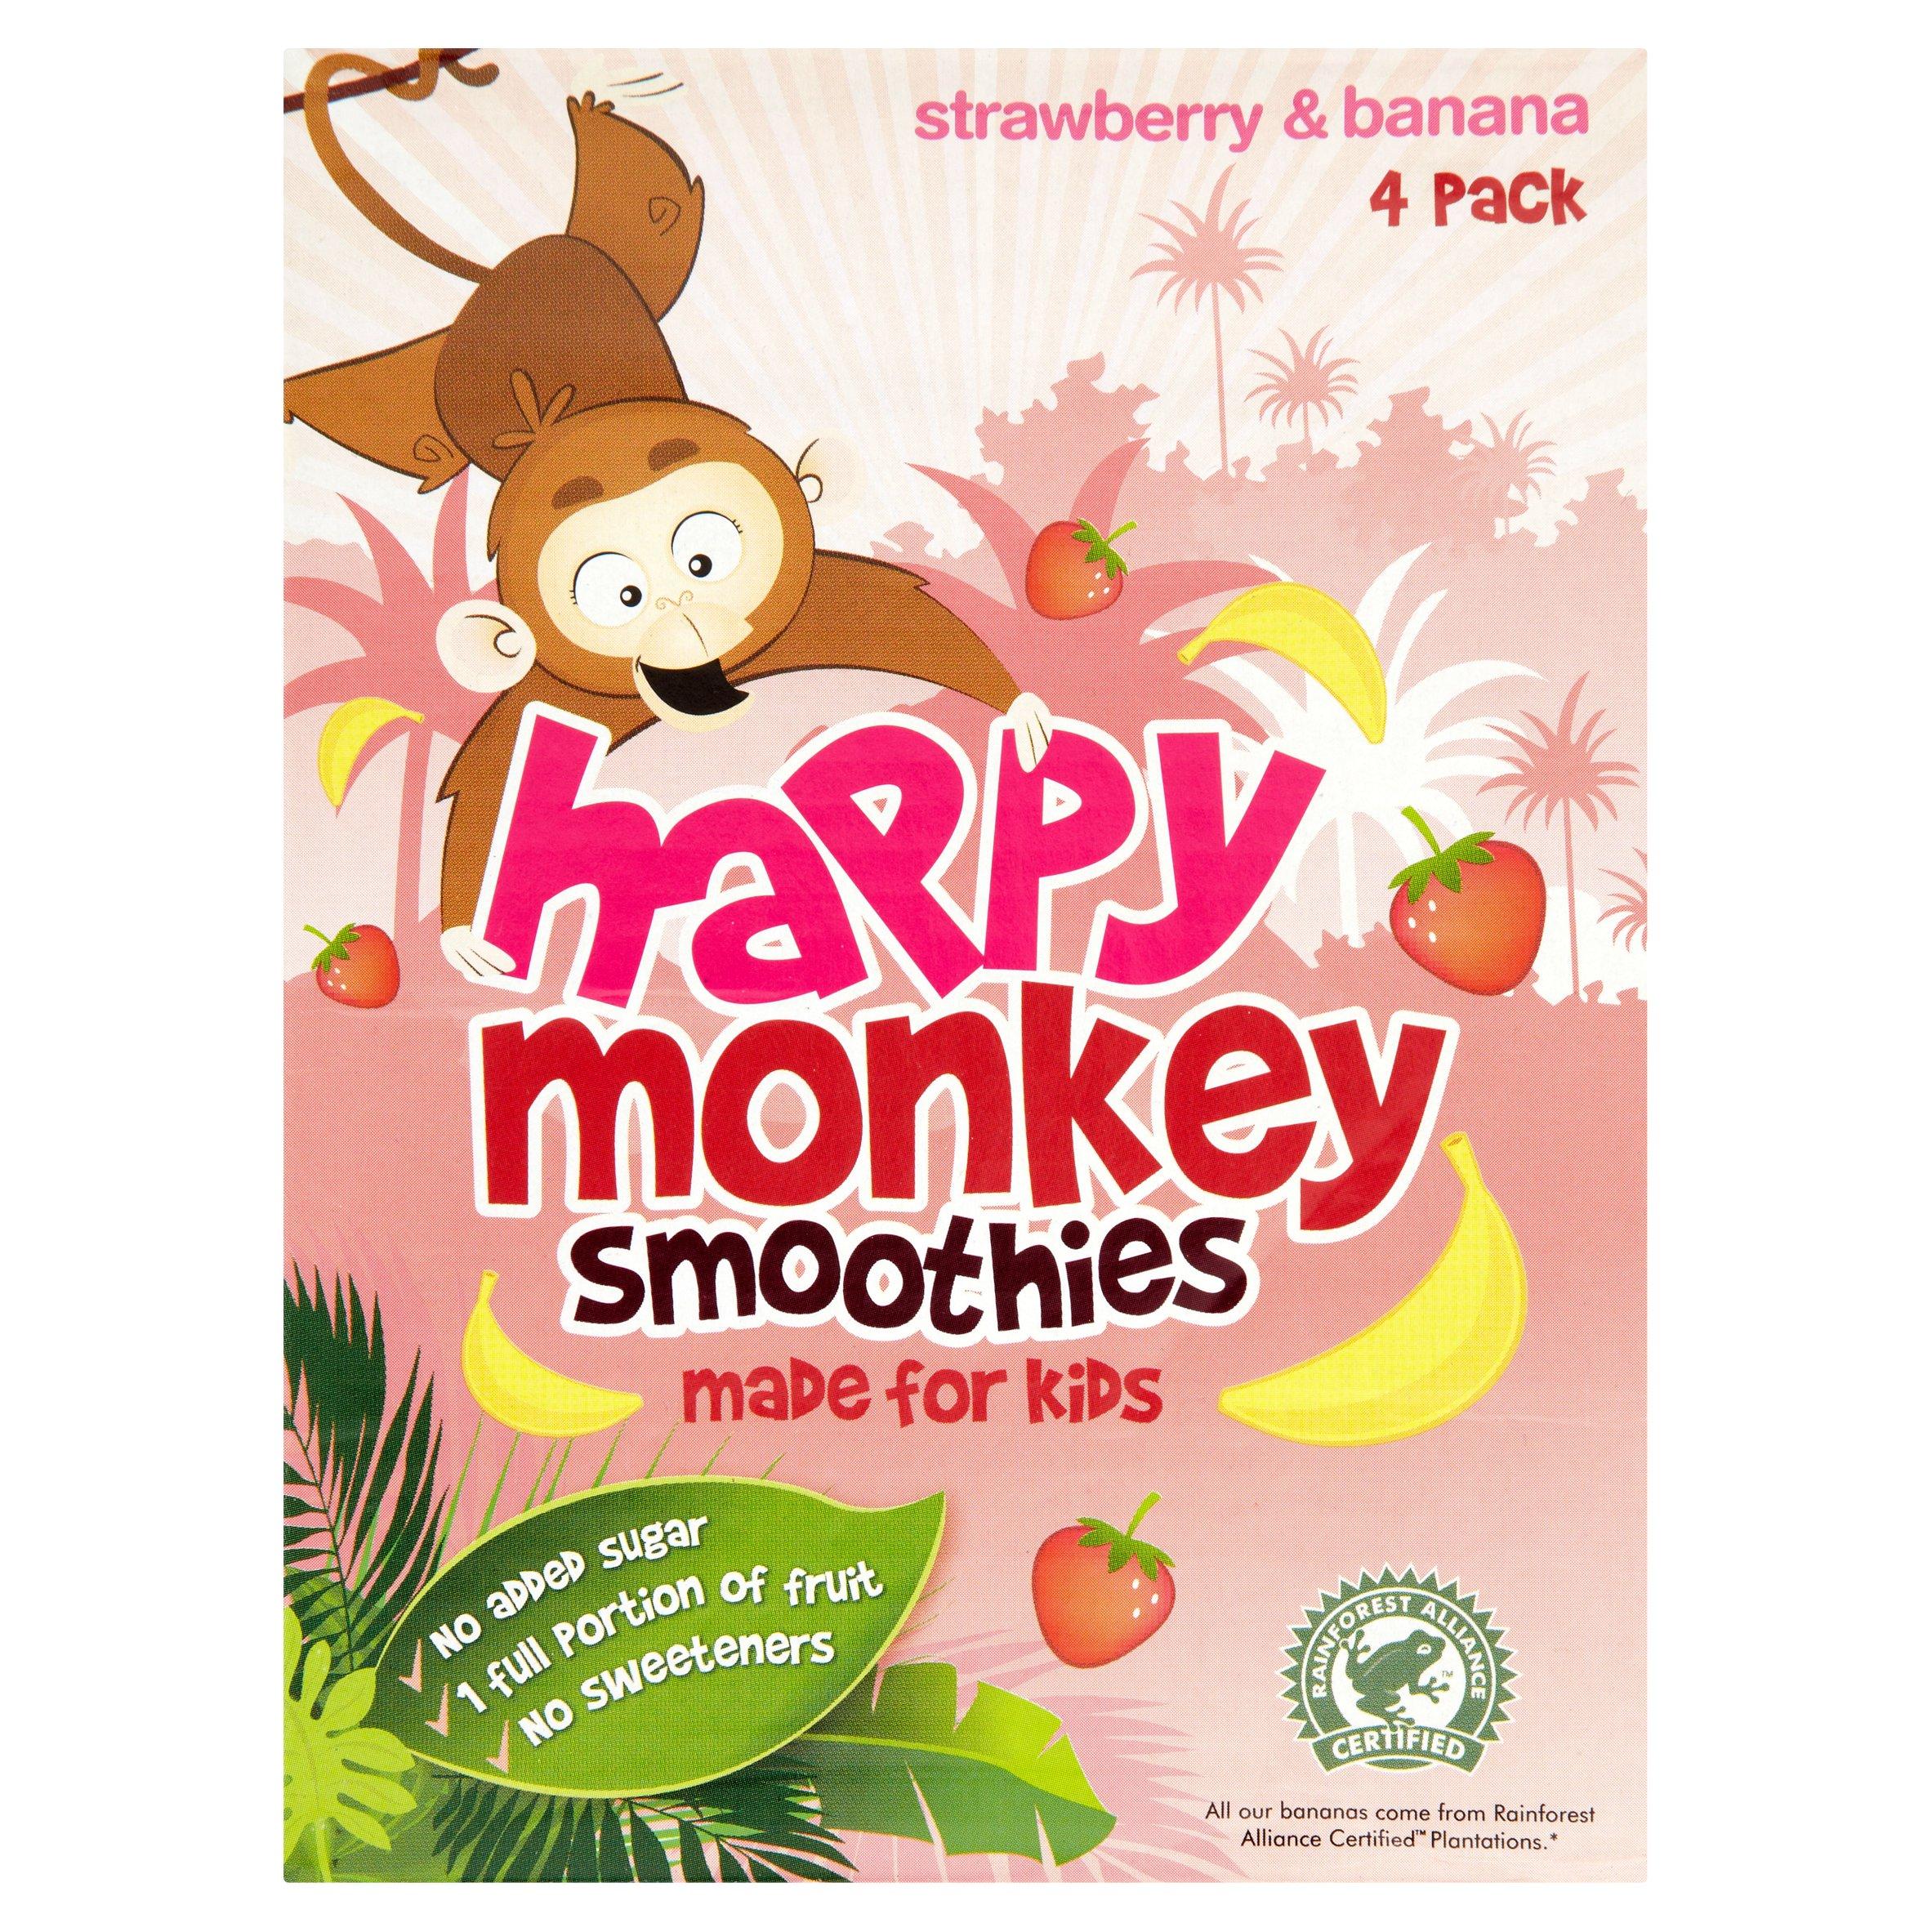 Happy Monkey Strawberries & Bananas 4 Pack